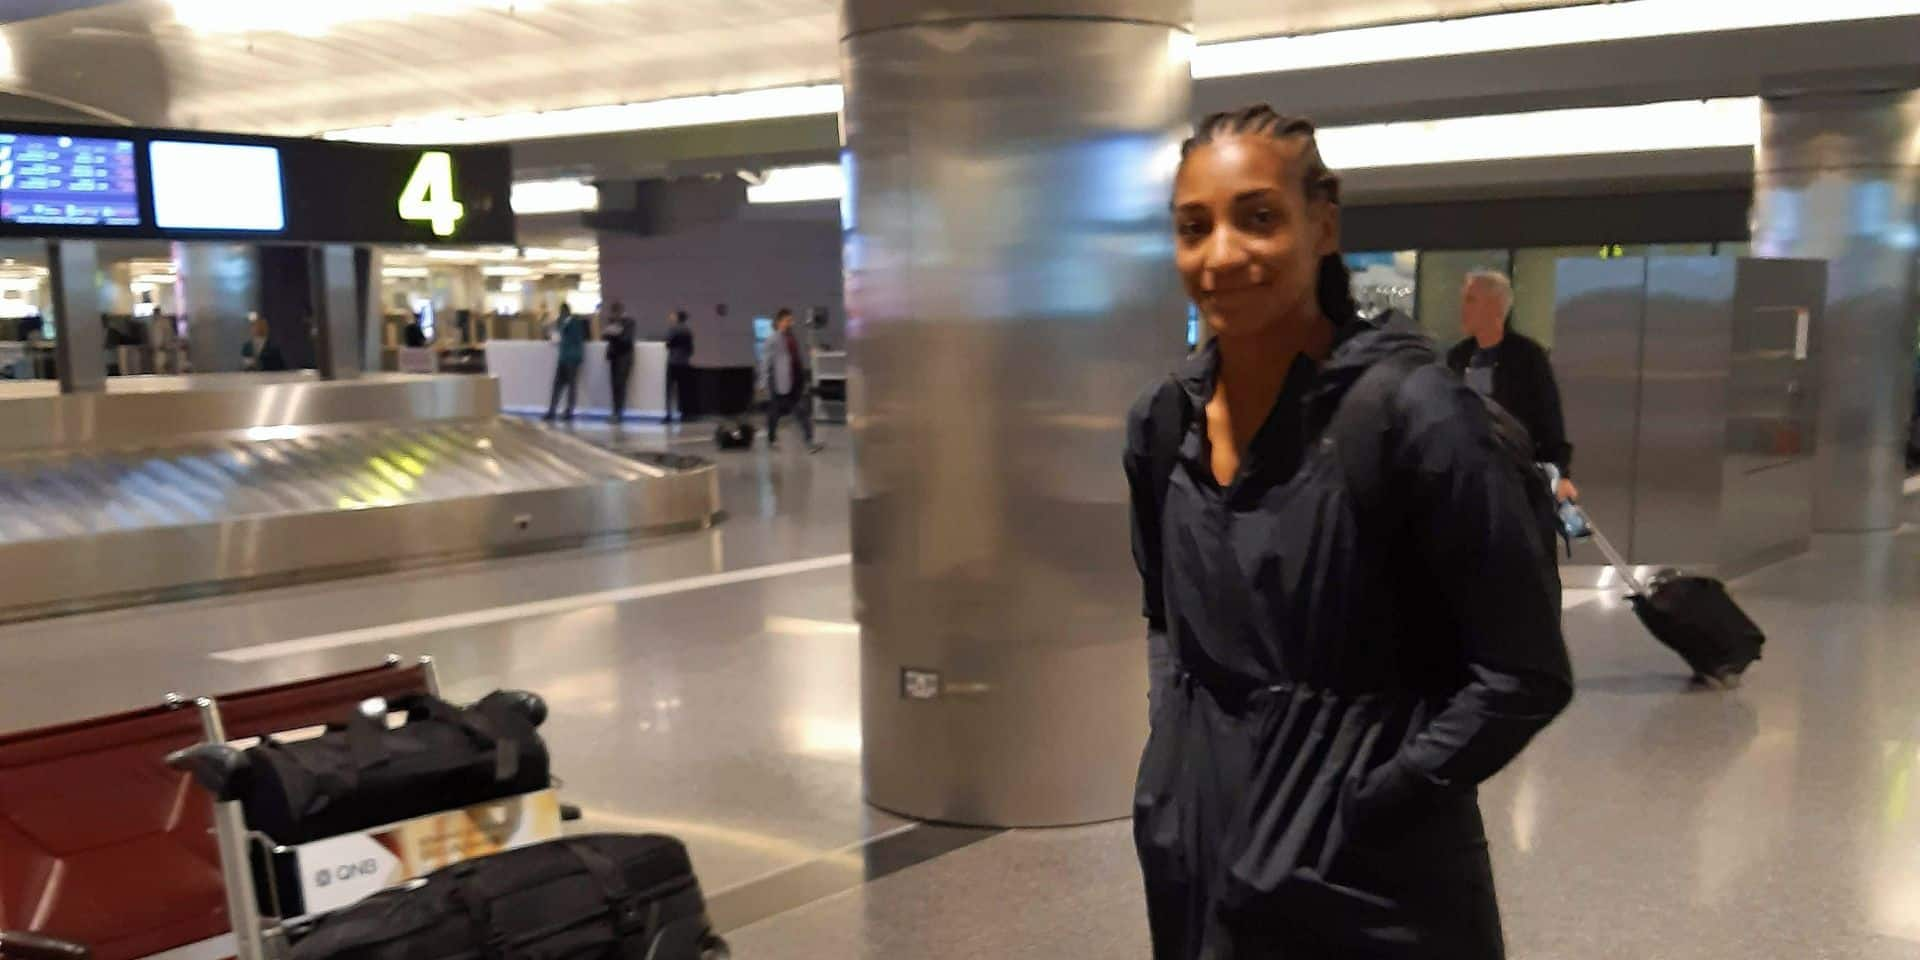 Mondiaux d'athlétisme: Nafi Thiam, Isaac Kimeli, Robin Hendrix et Thomas De Bock sont bien arrivés à Doha